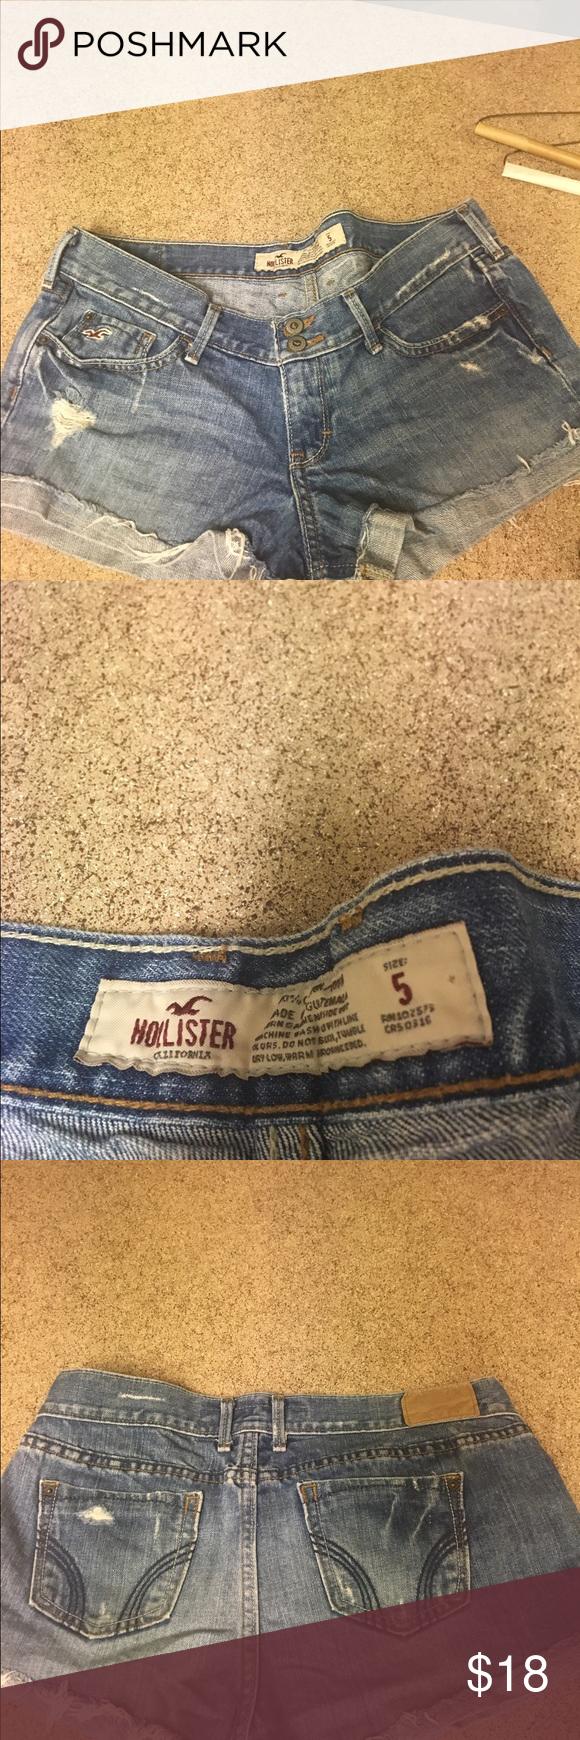 *SALE* Hollister blue jean shorts size 5 Hollister blue jean shorts size 5 Hollister Shorts Jean Shorts